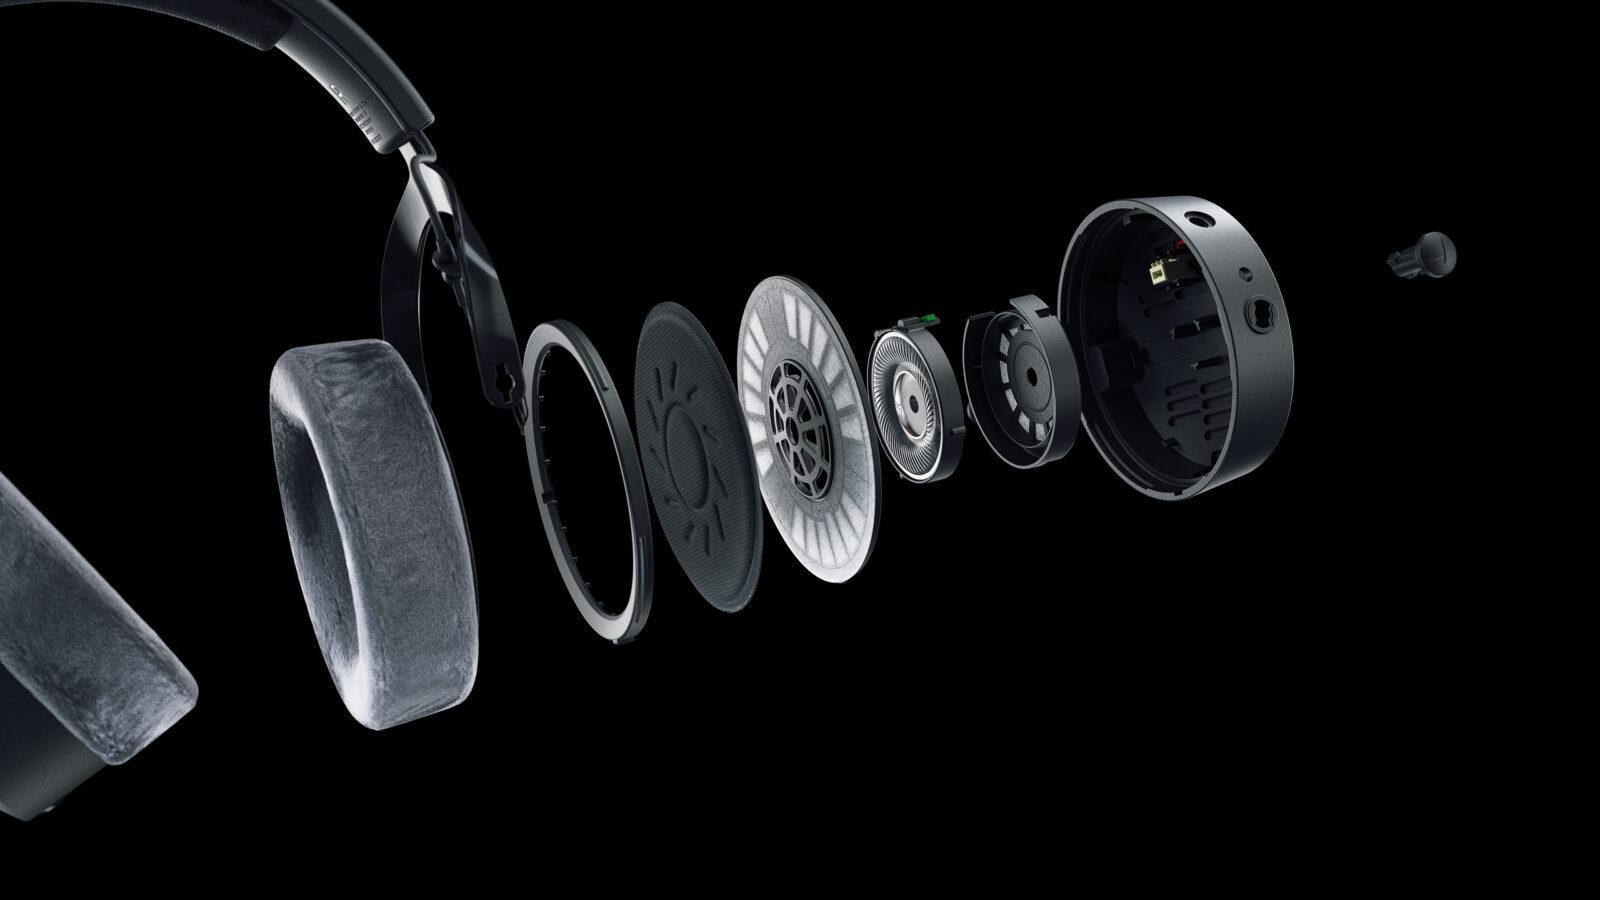 Beyerdynamic представила новые наушники и микрофоны PRO X для креаторов (csm PIC DT700PRO X 21 07 exploded view v1 02233b7cd8)